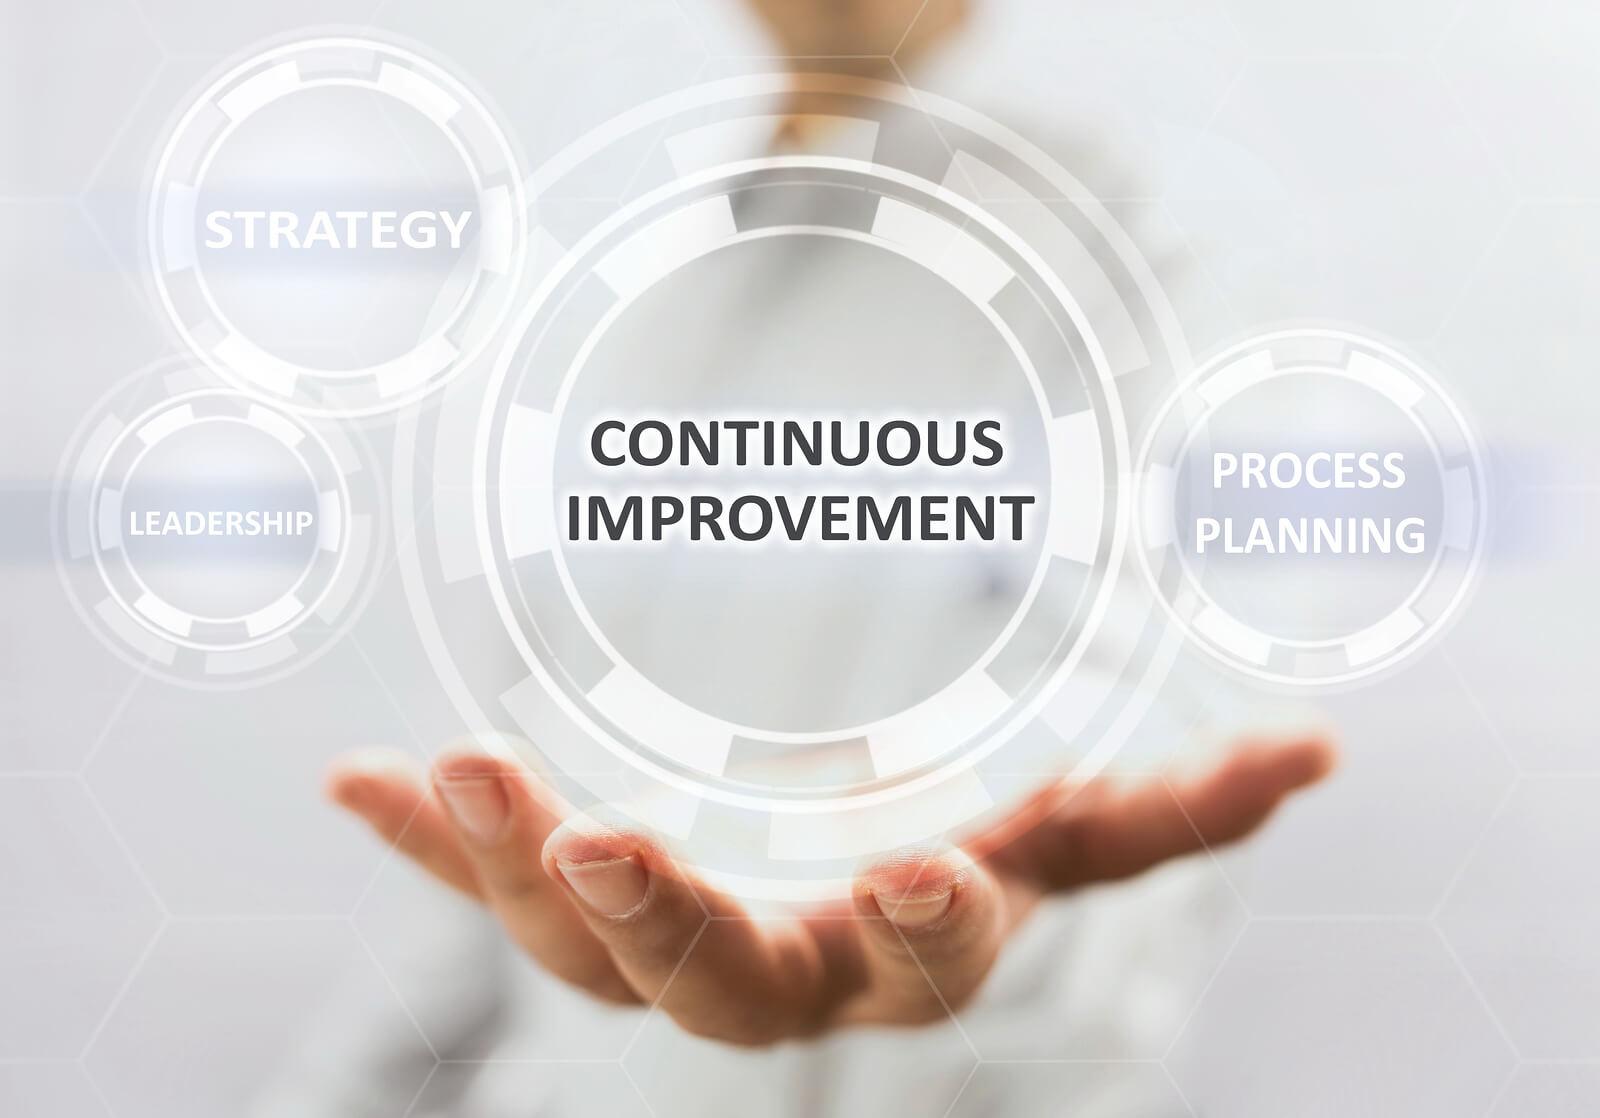 continuous improvement image